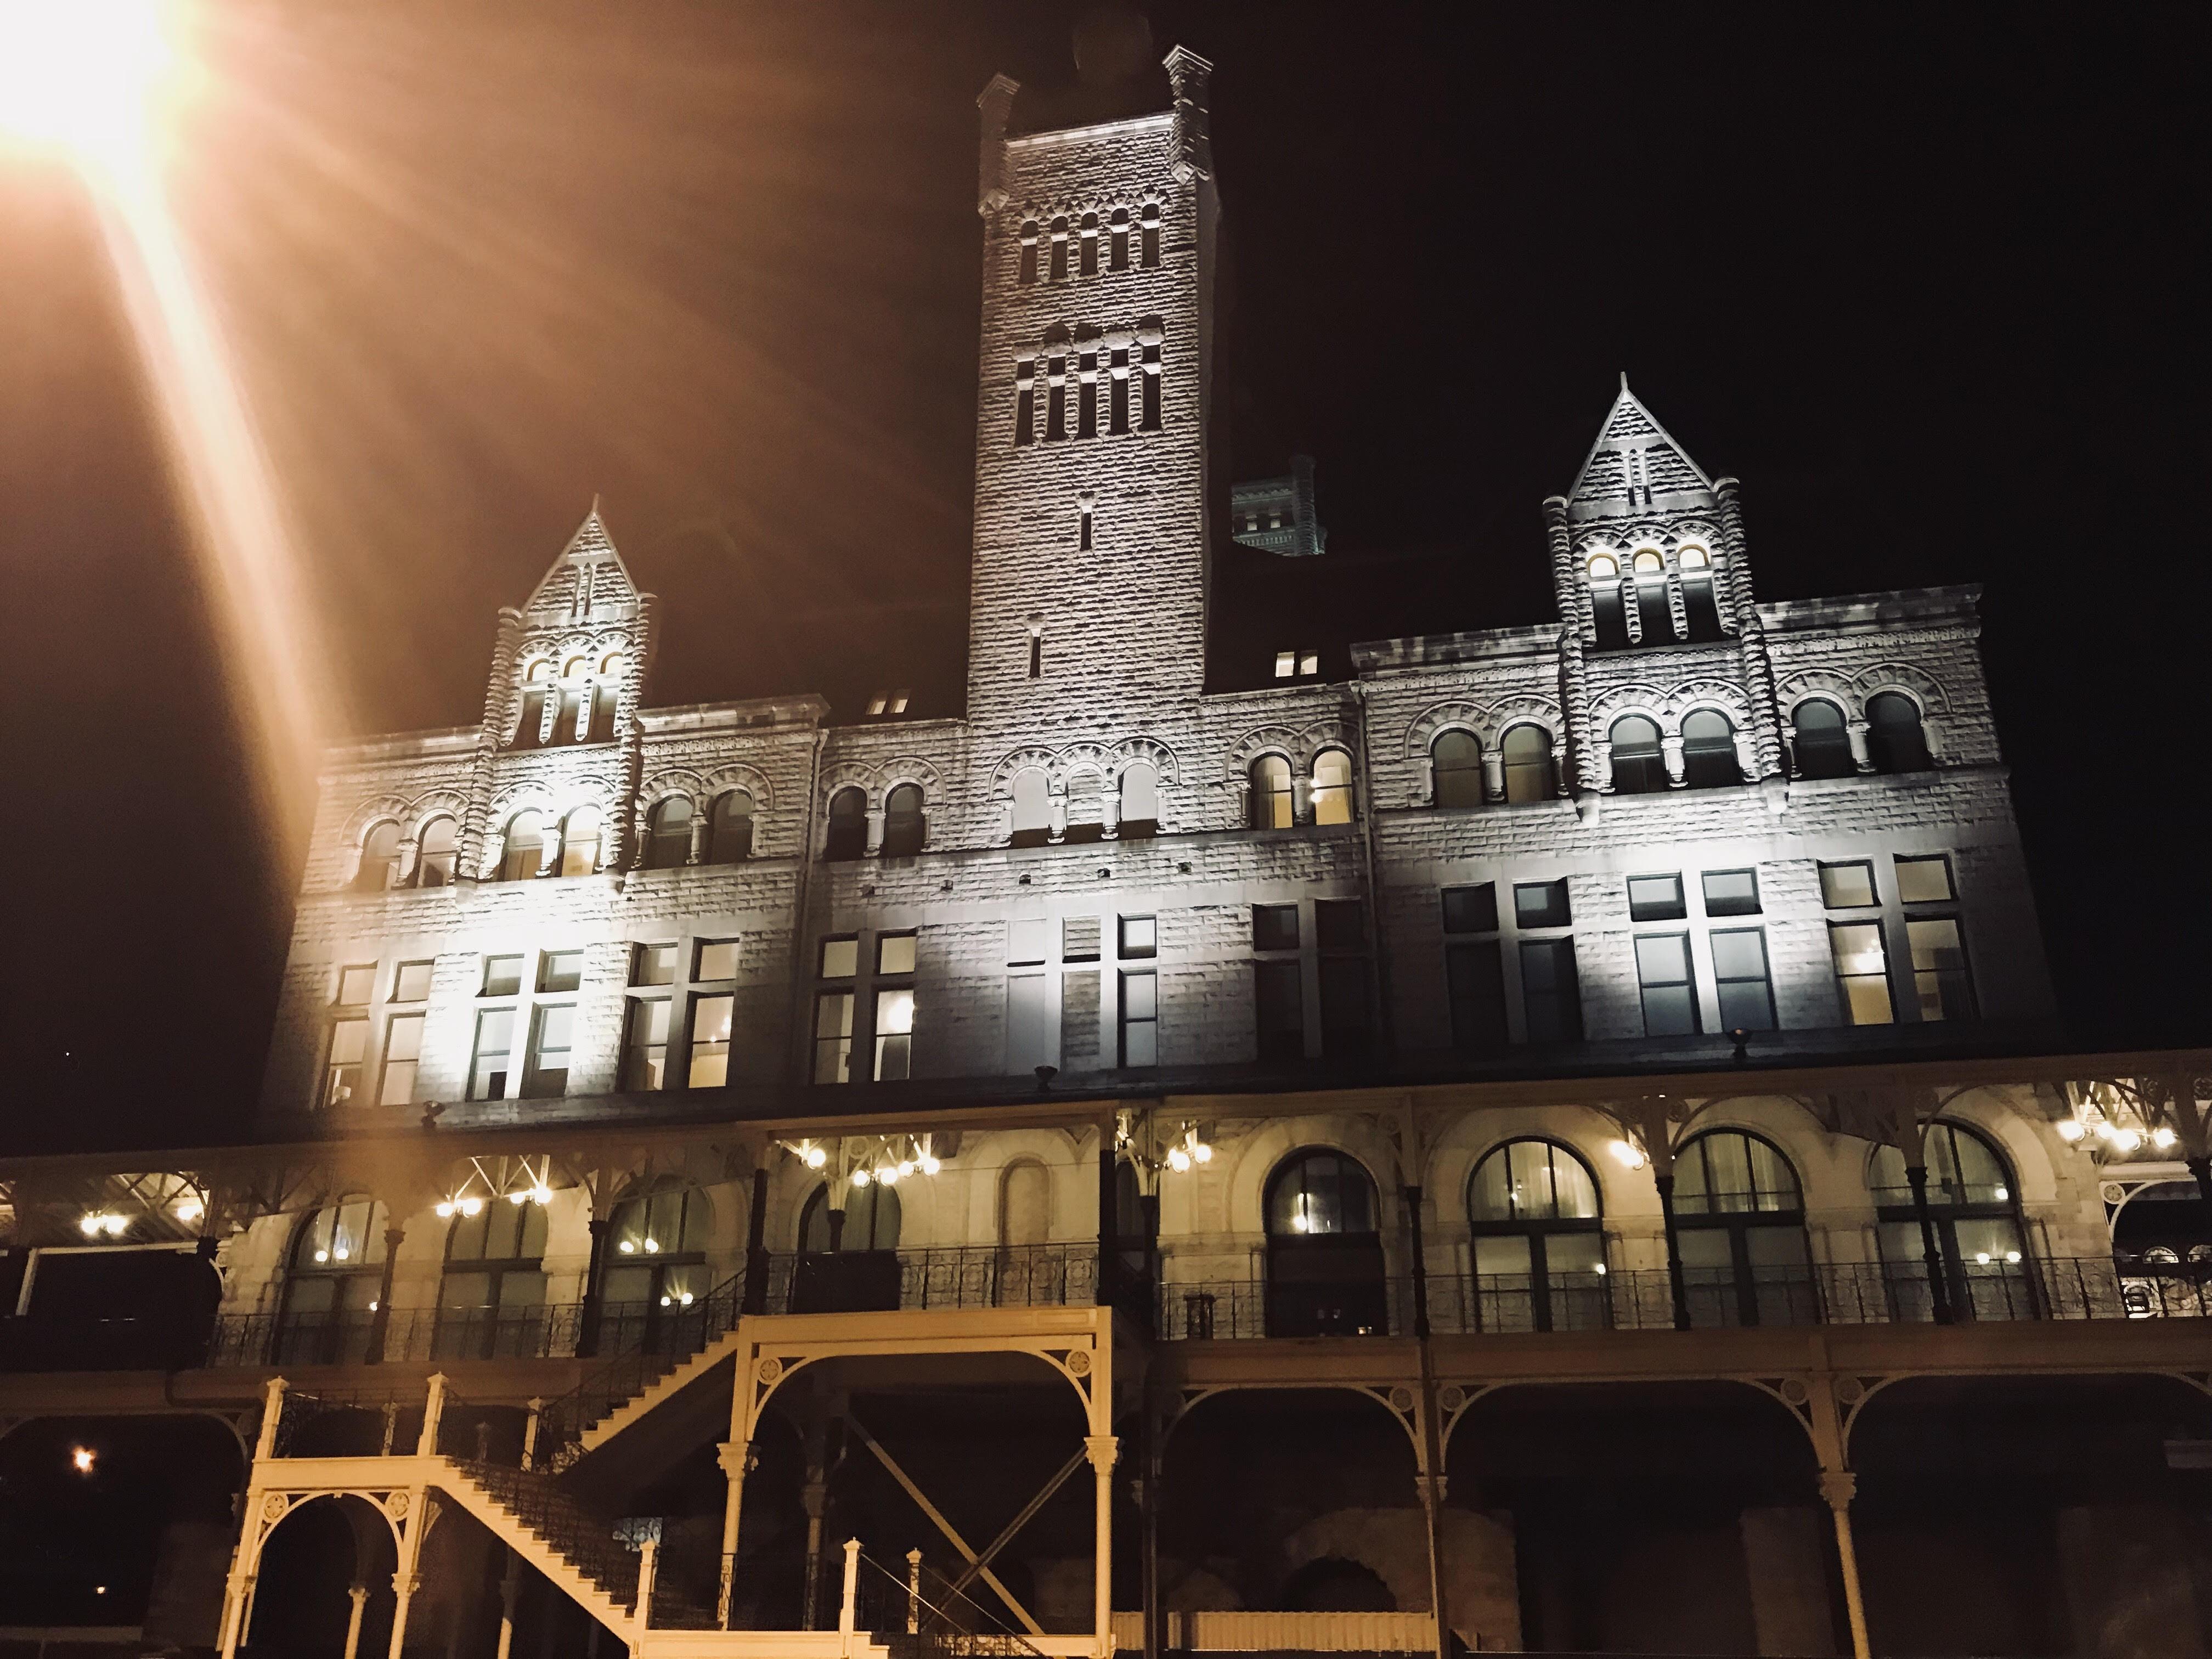 Train Castle